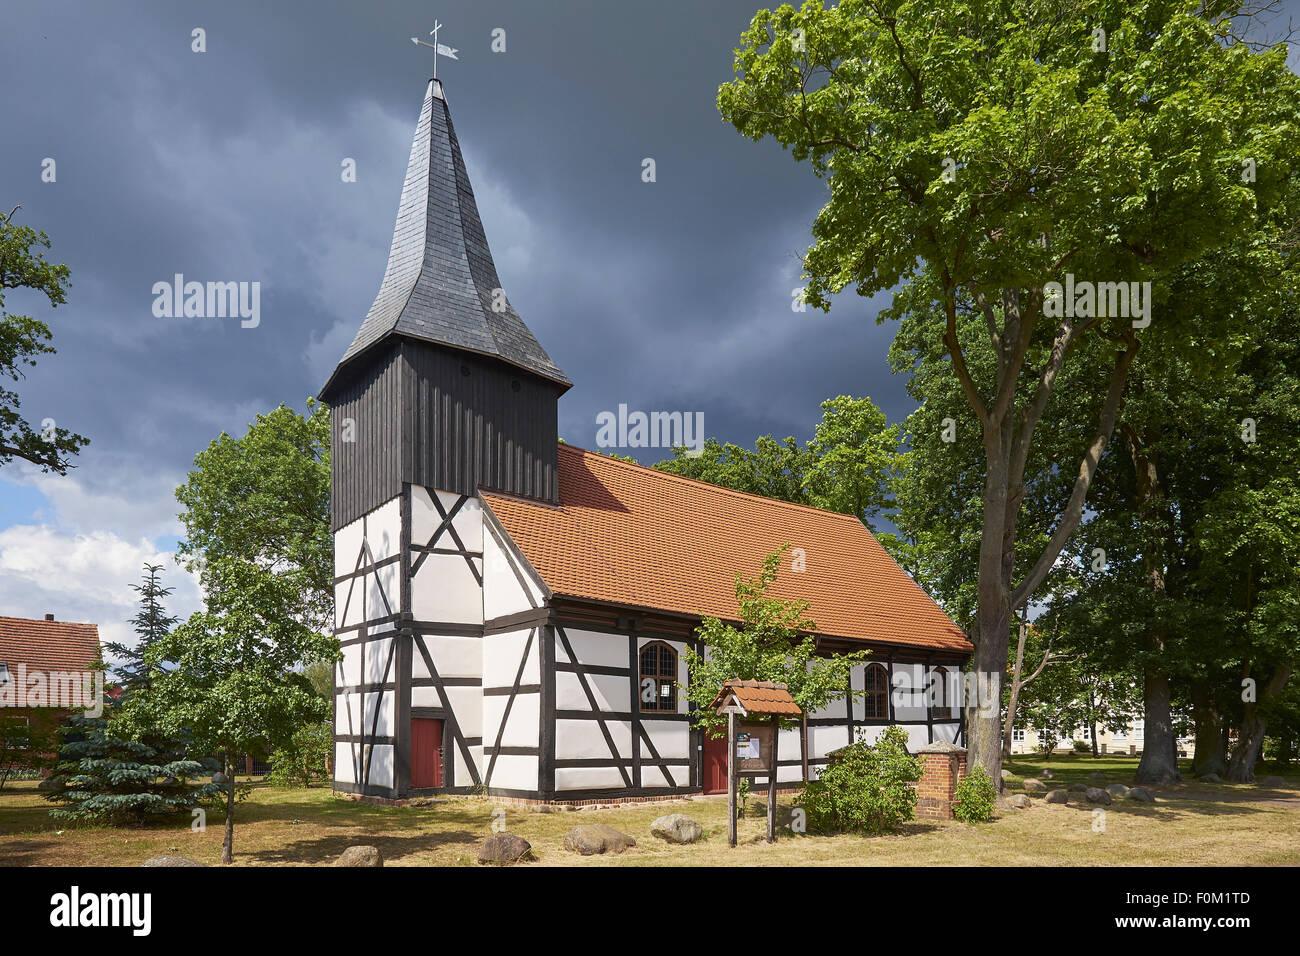 Timbered church in Grube / Bad Wilsnack, Prignitz, Brandenburg, Germany - Stock Image